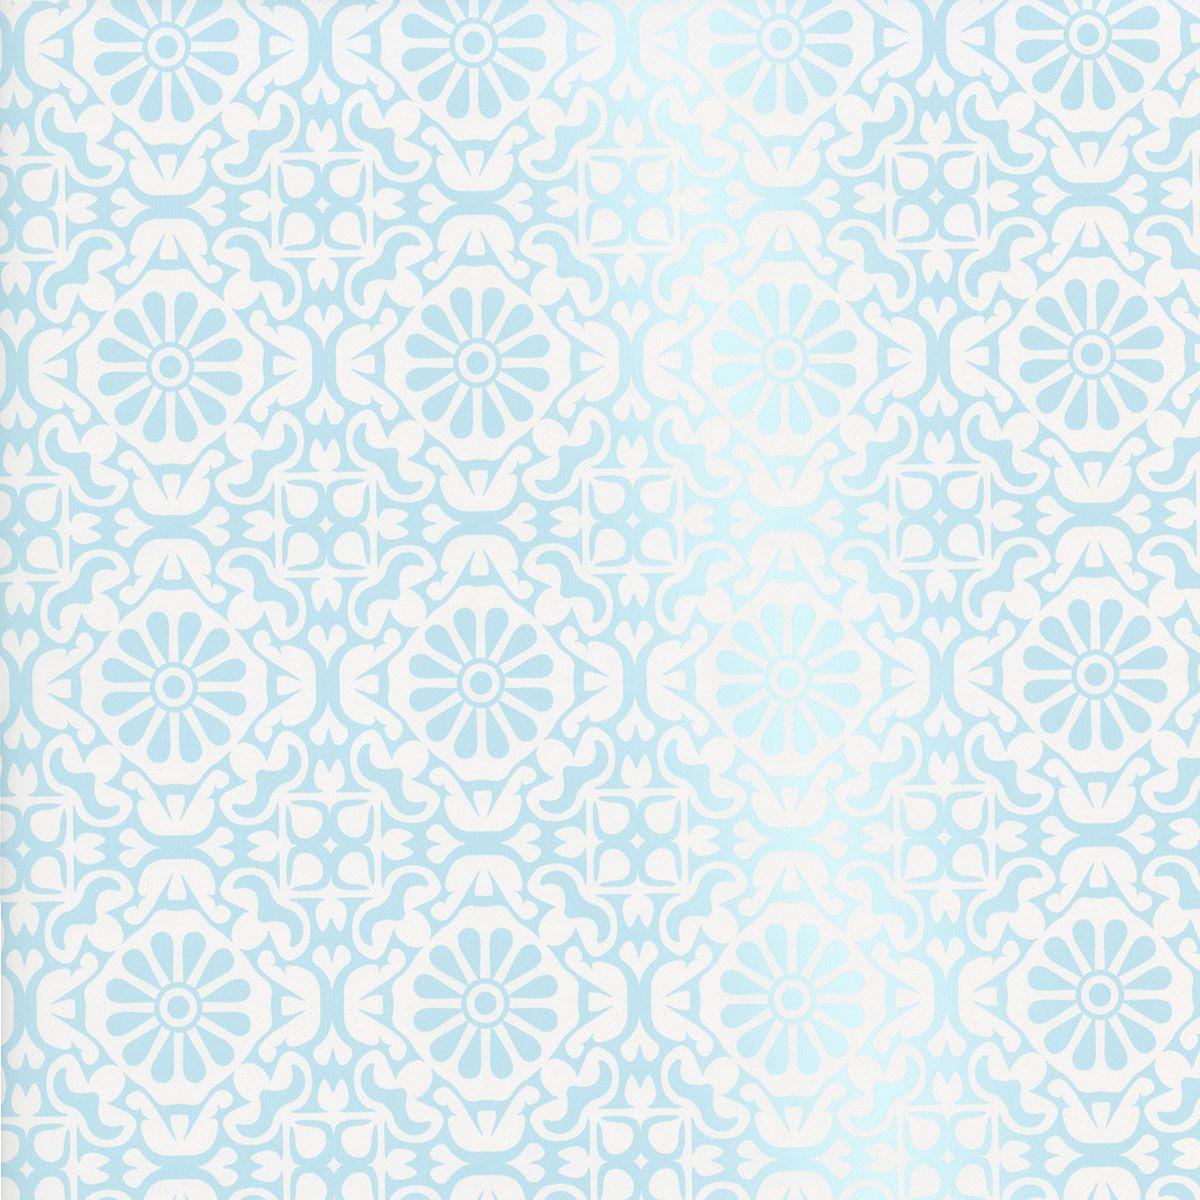 Lavieenrougemur Blancimage Via Mommo Designpapier Peint Humming Birdspapier  Peint Augustine Thibautpapier Peint Geraniums Thibautpapier Peint Royal  ...